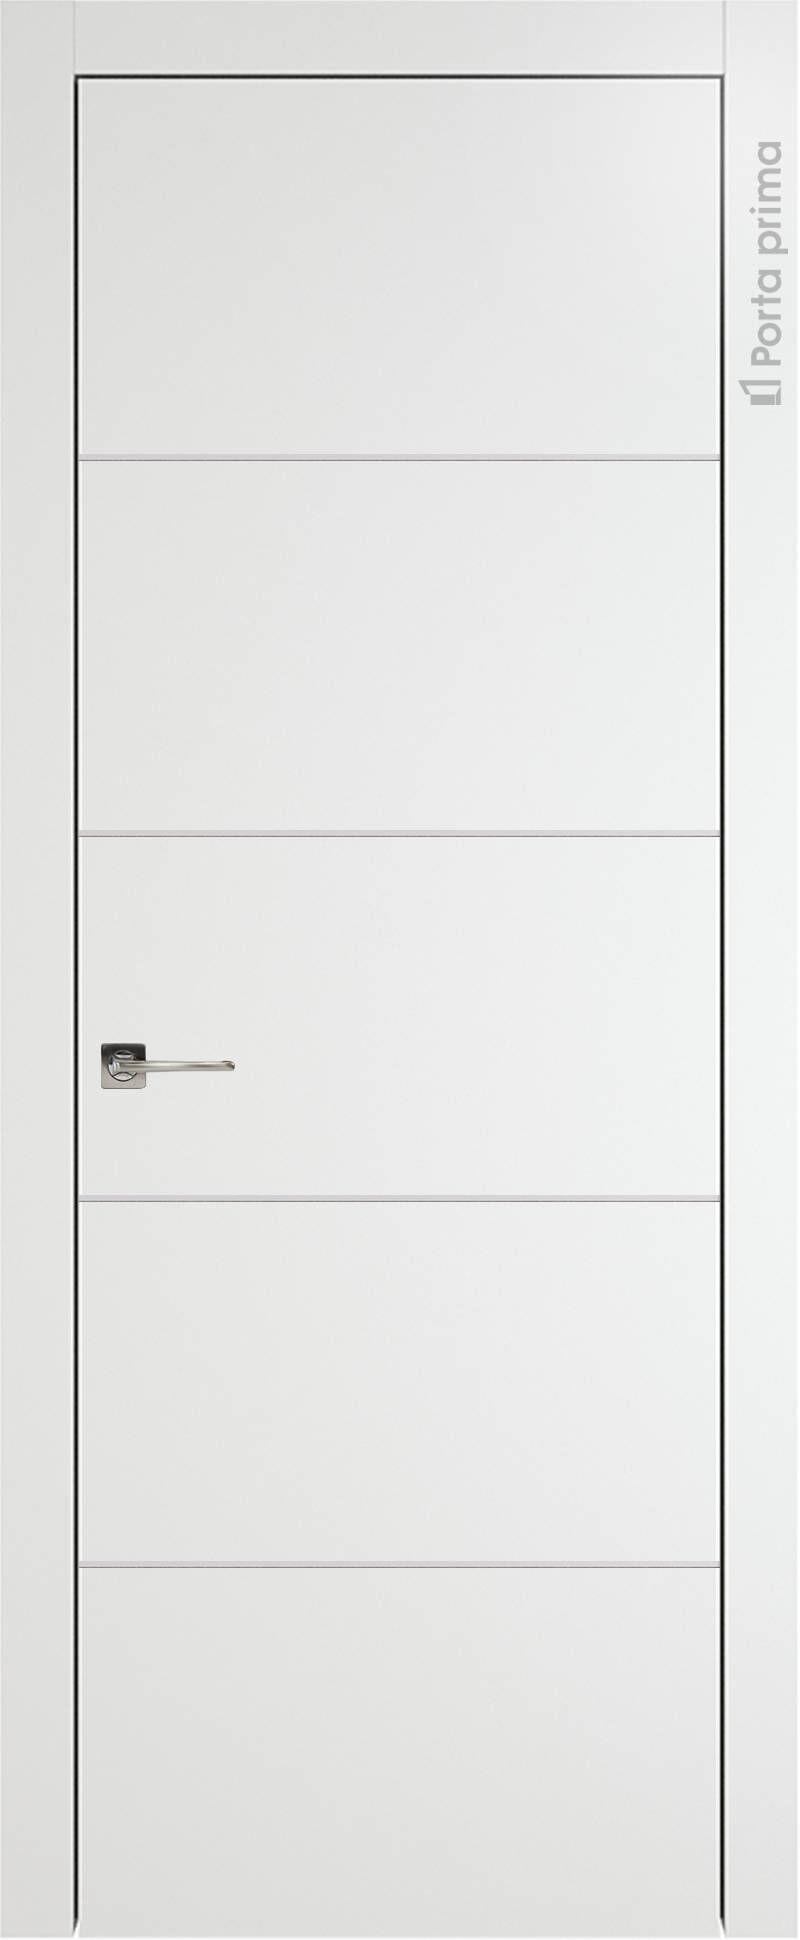 Tivoli Д-3 цвет - Белая эмаль (RAL 9003) Без стекла (ДГ)